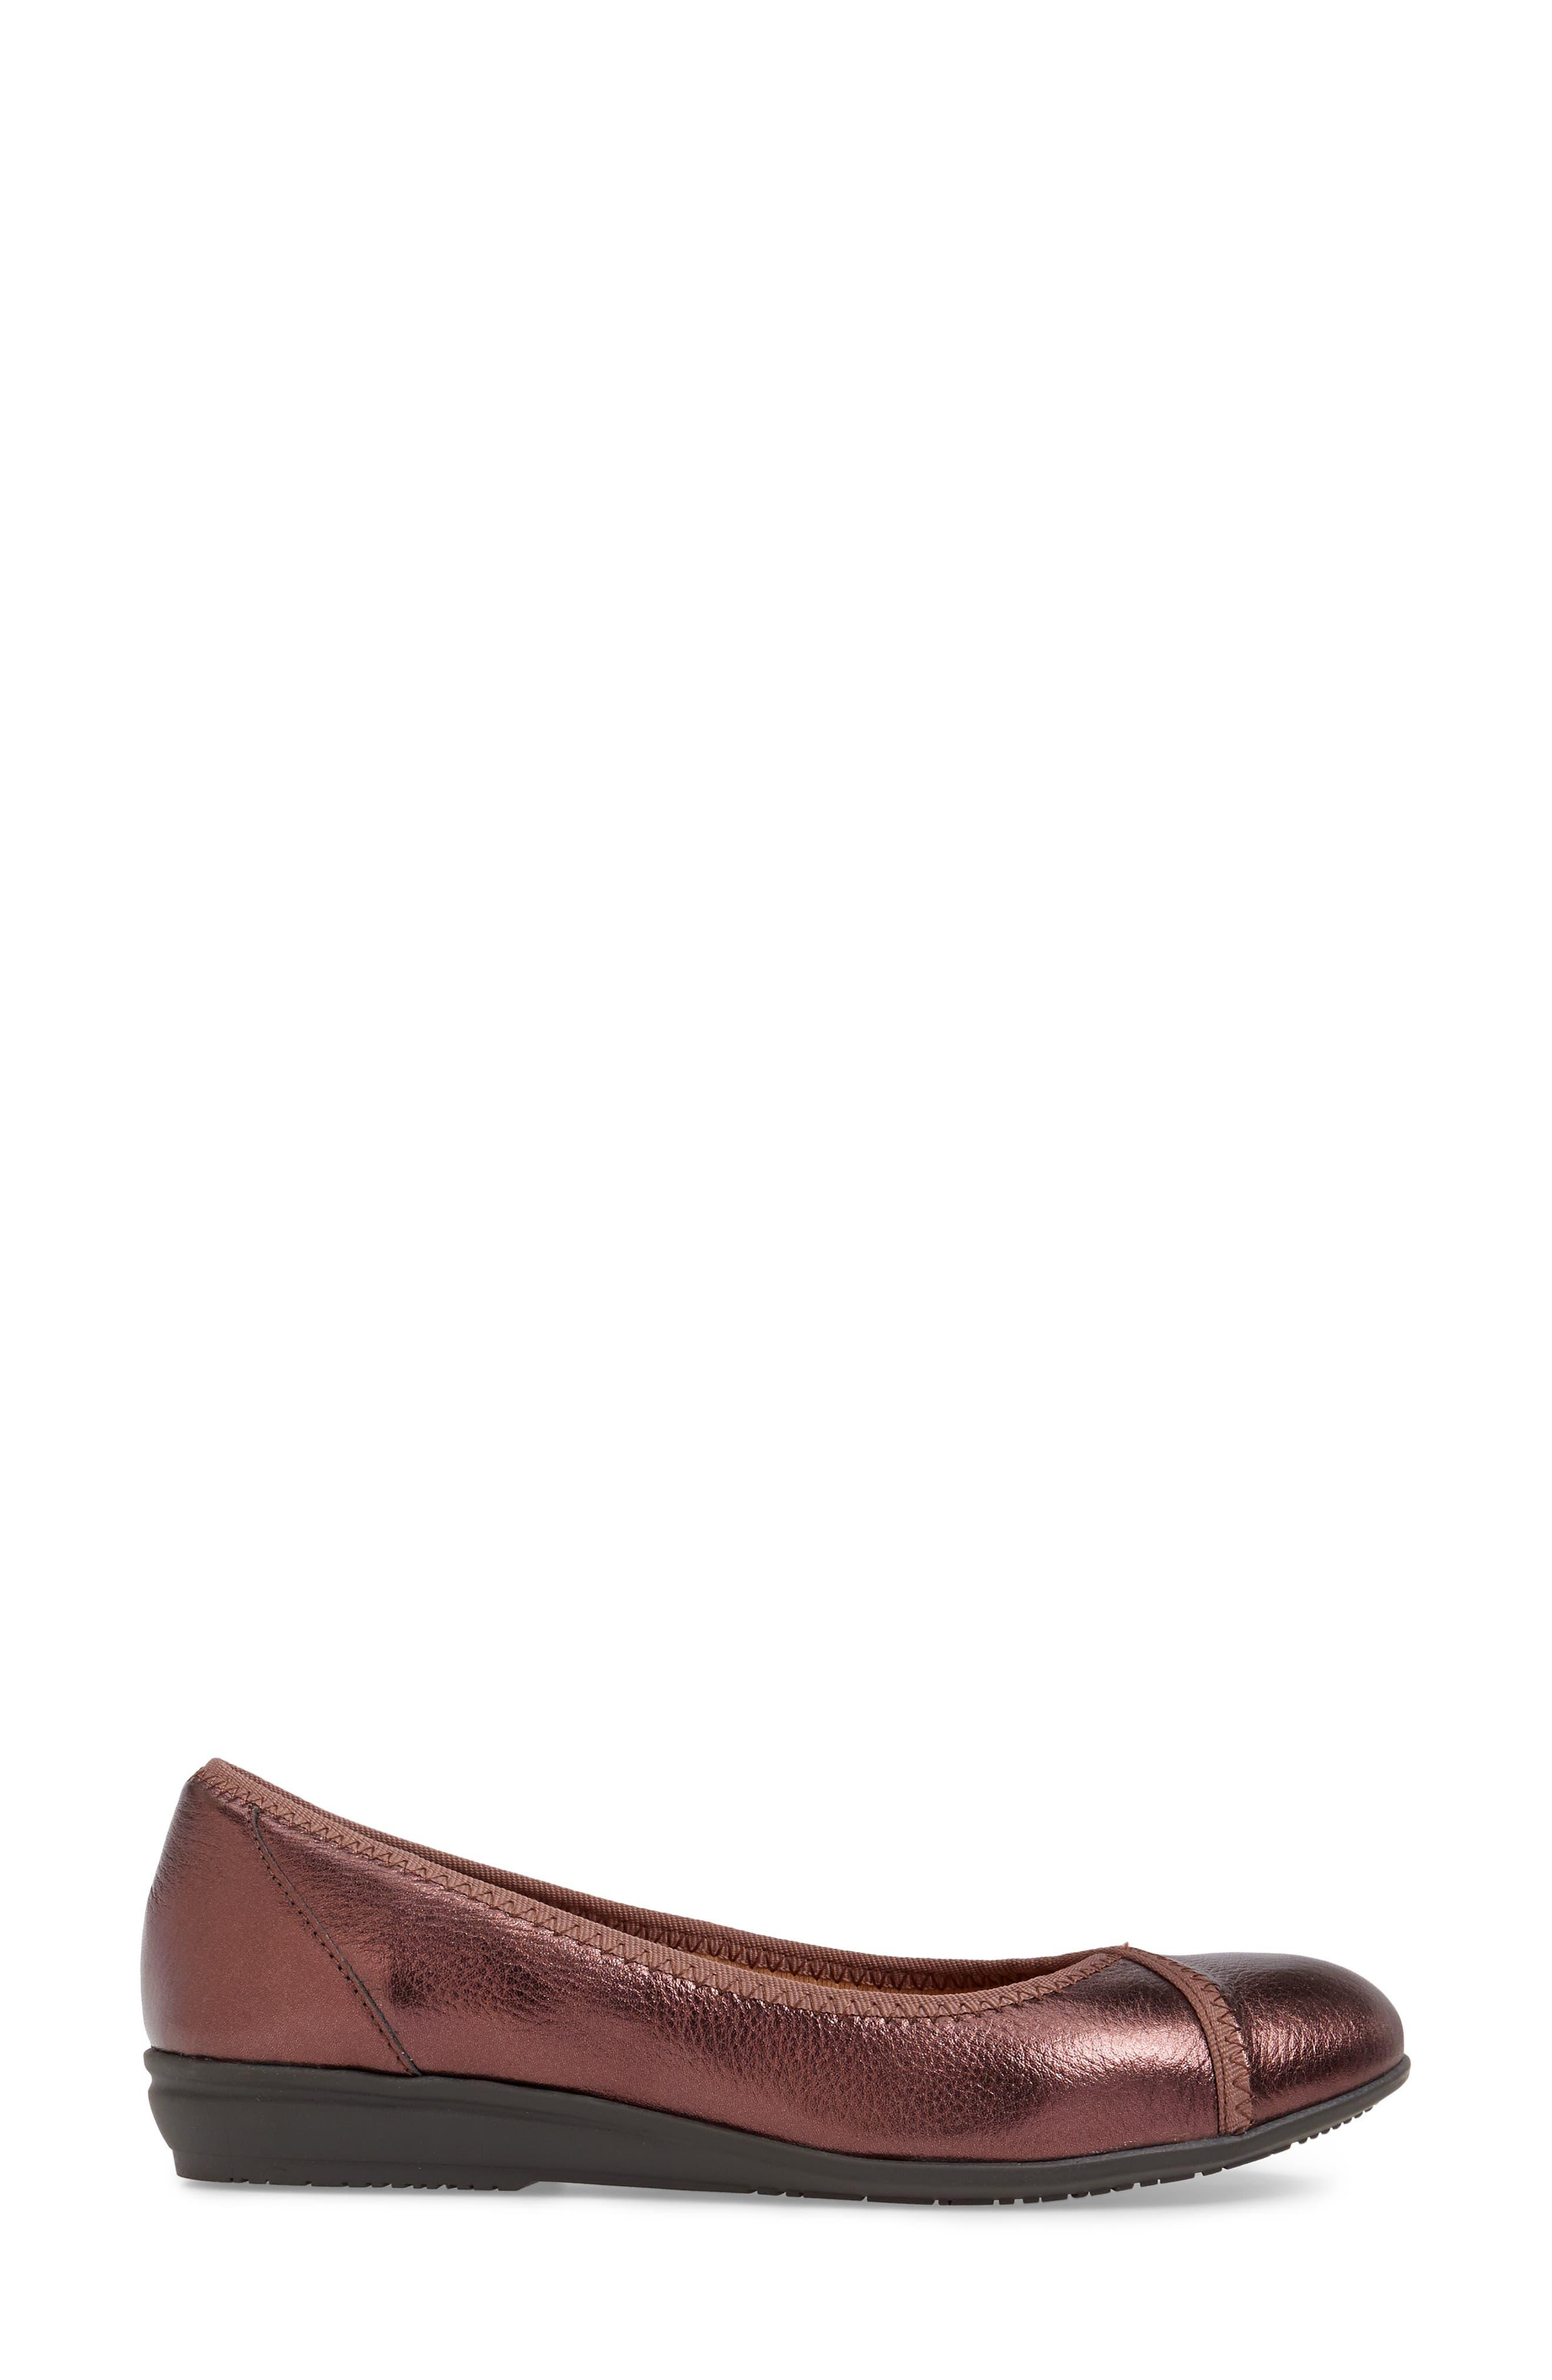 Eaton Flat,                             Alternate thumbnail 3, color,                             Chianti Metallic Leather